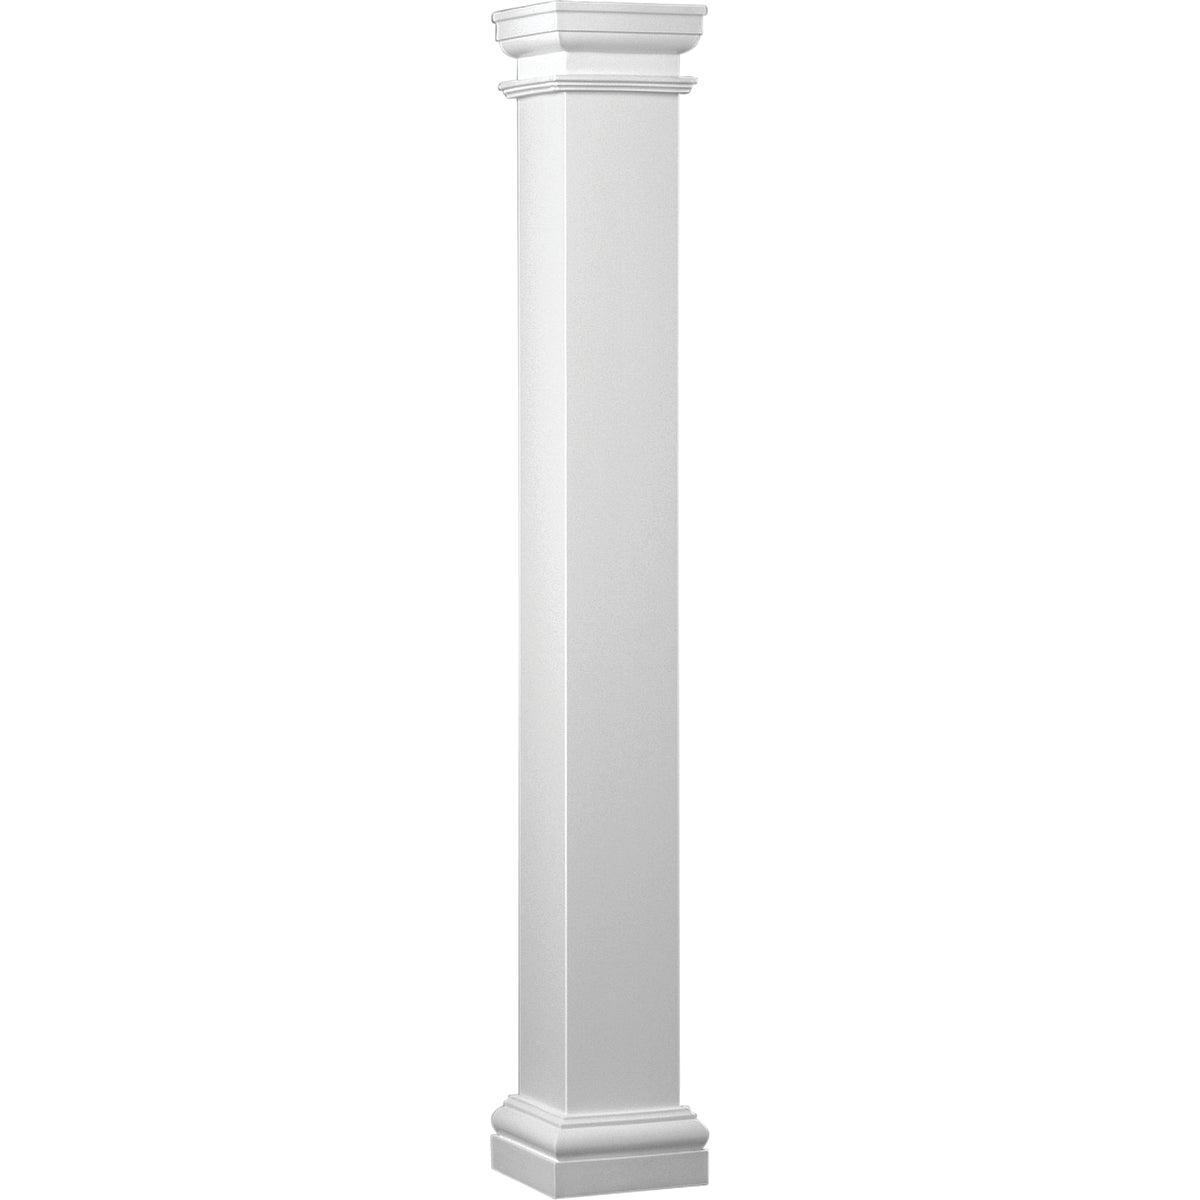 Duralite Fiberglass Column